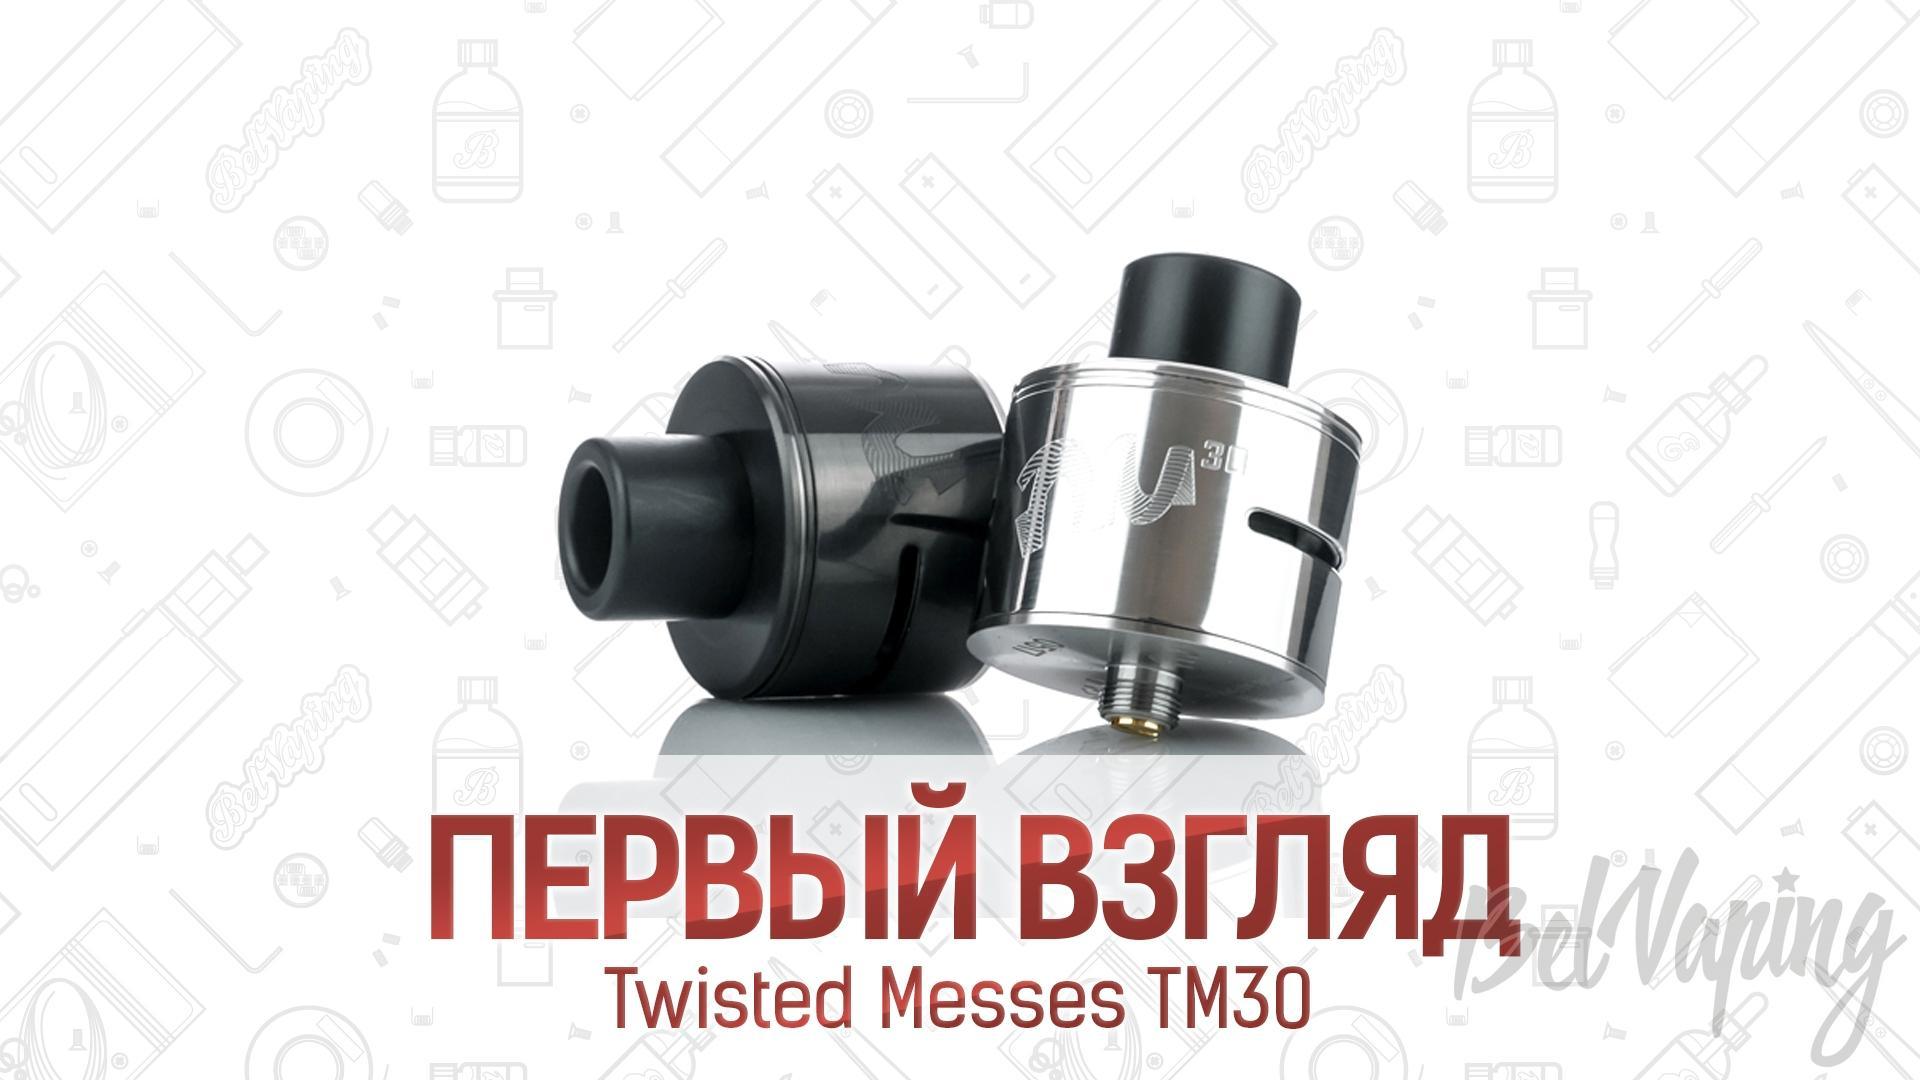 Twisted Messes TM30. Первый взгляд